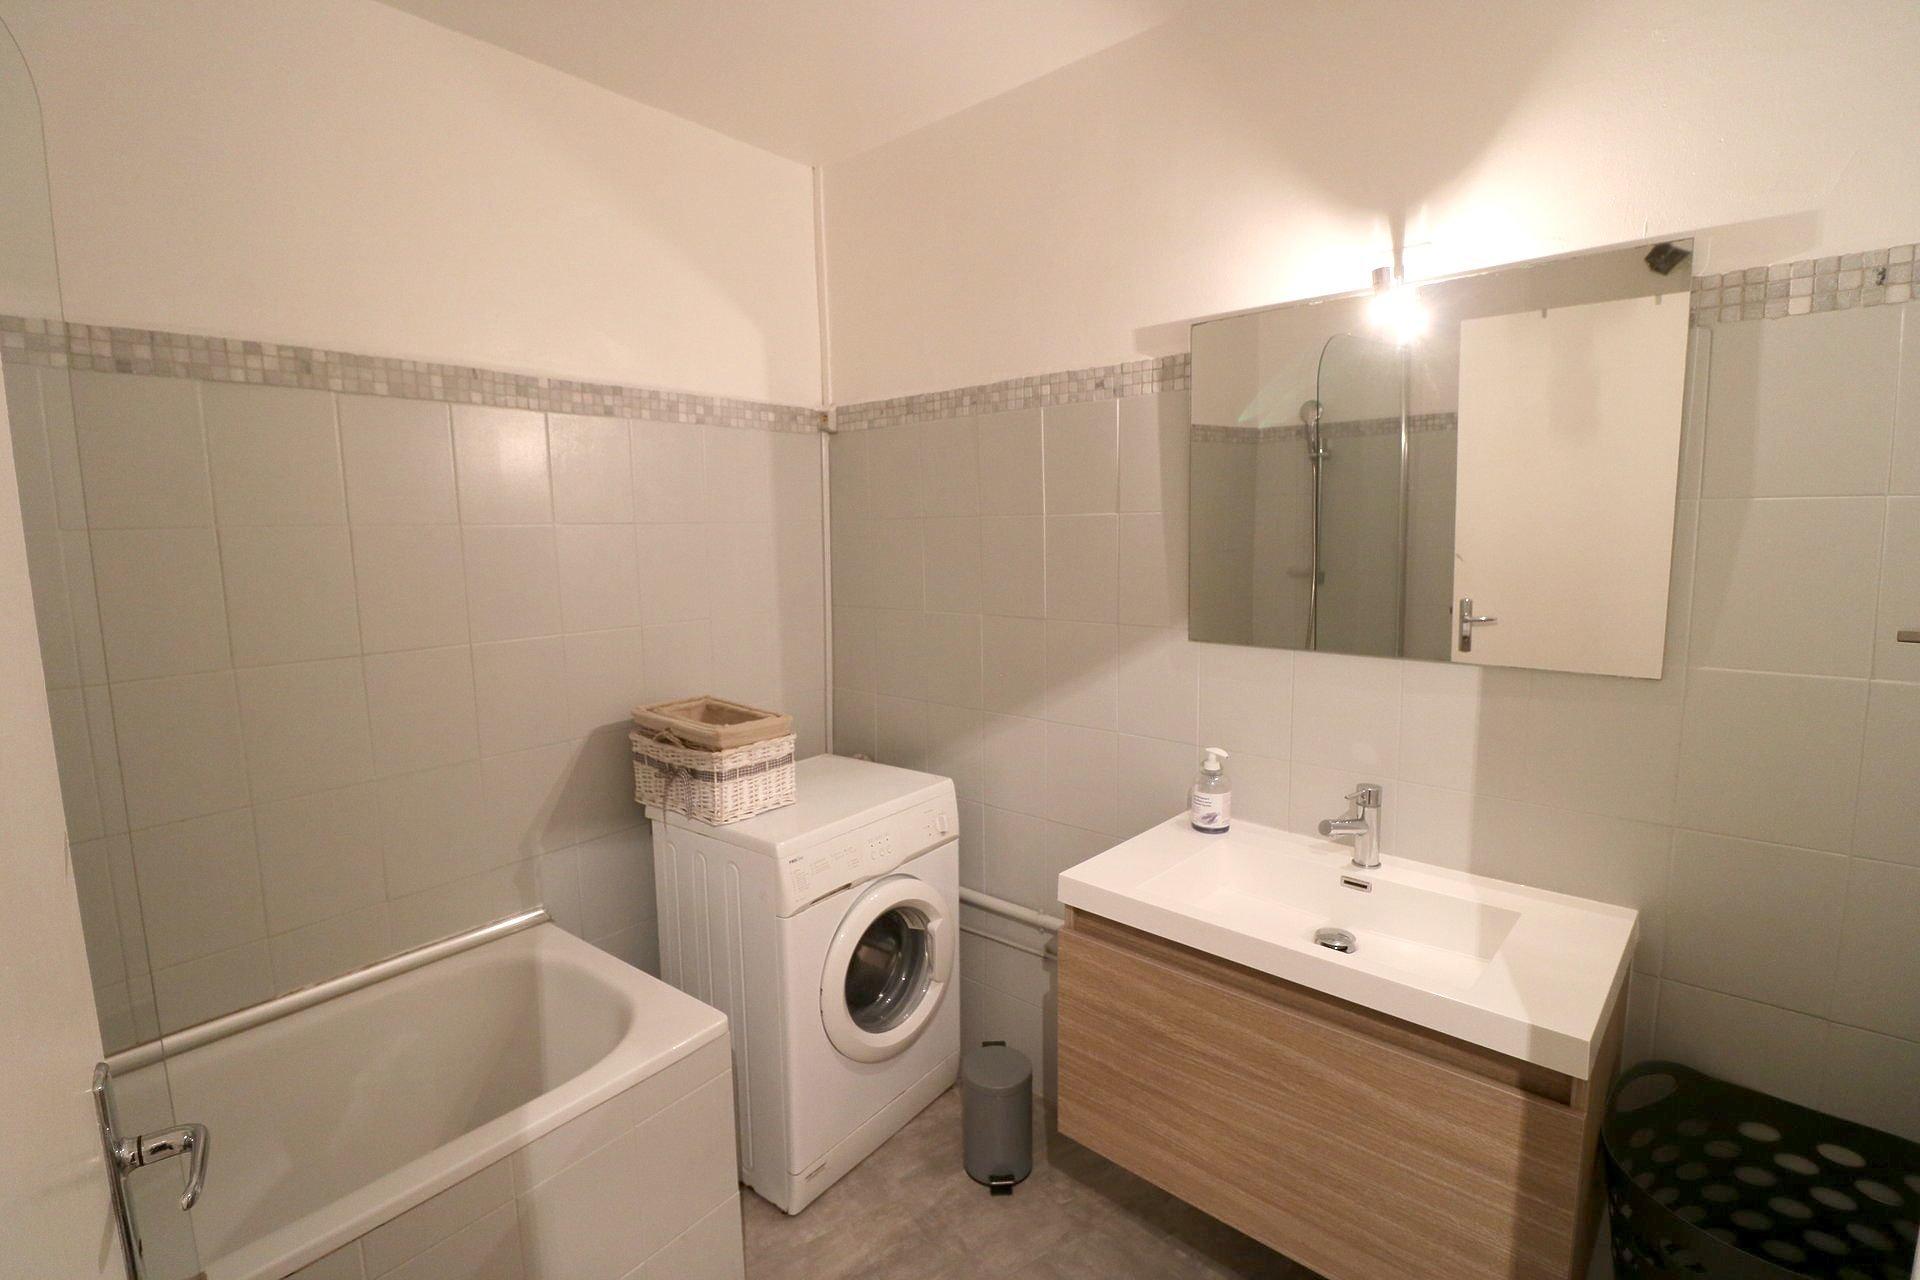 Affitto Appartamento - Nizza (Nice) Coulée verte